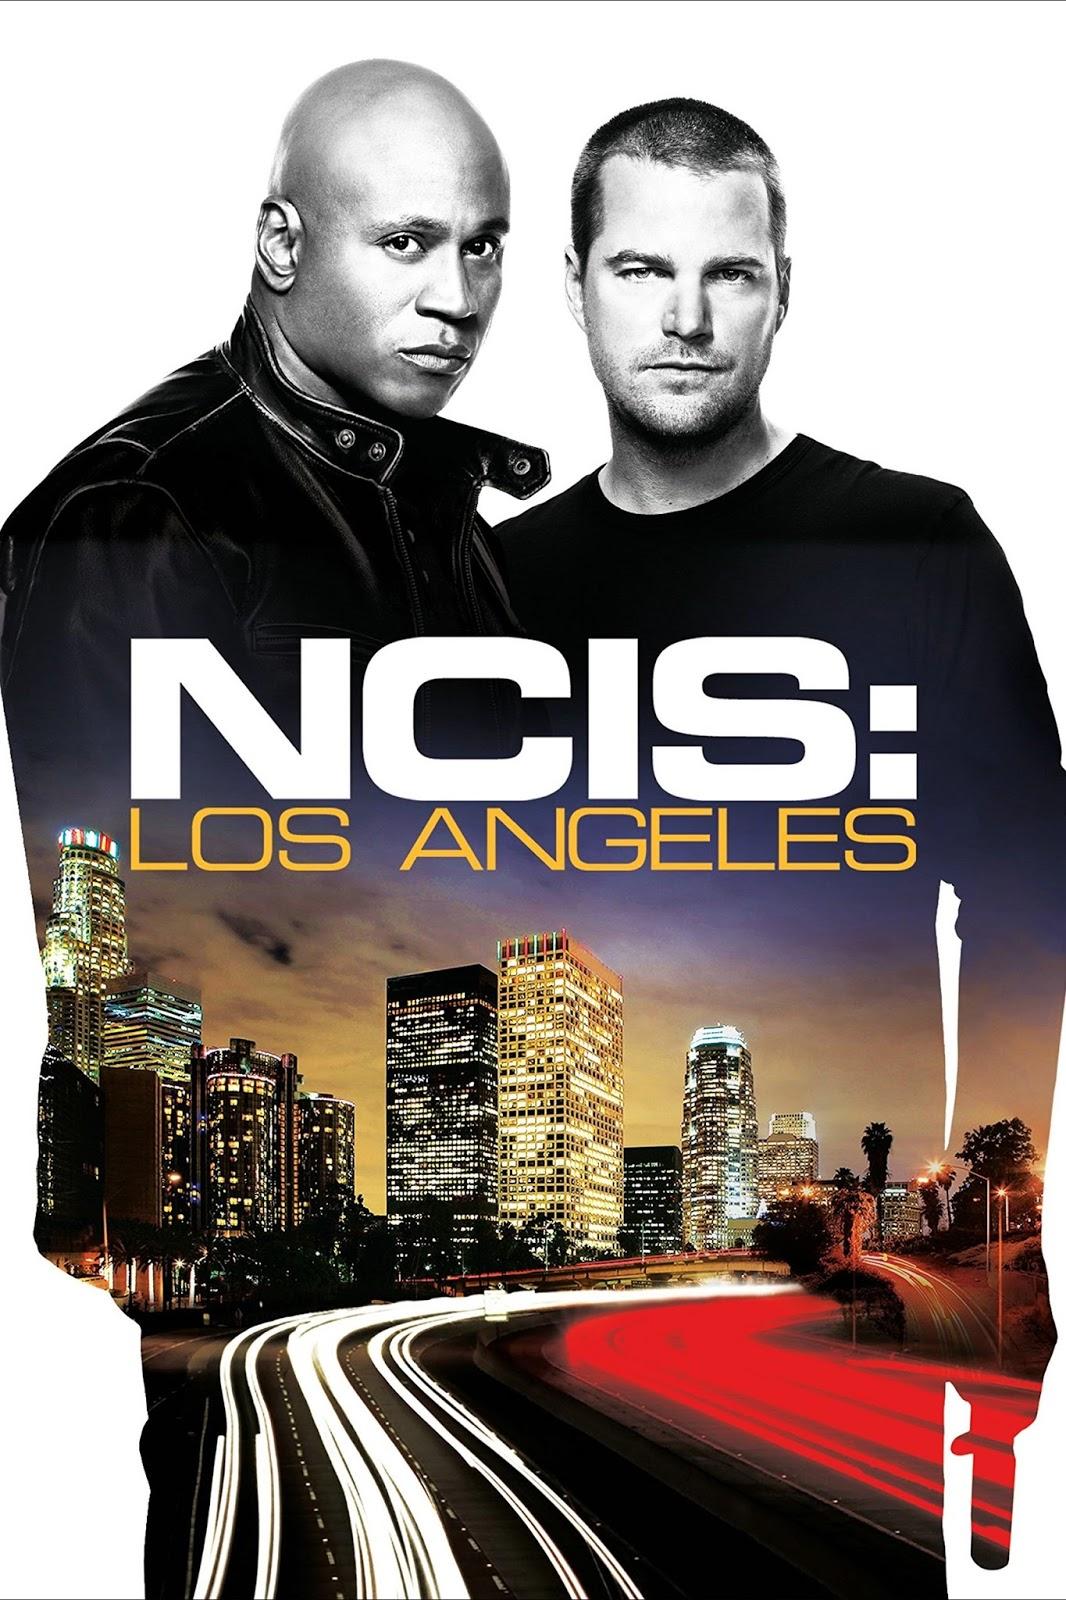 NCIS: Los Angeles T8 E3